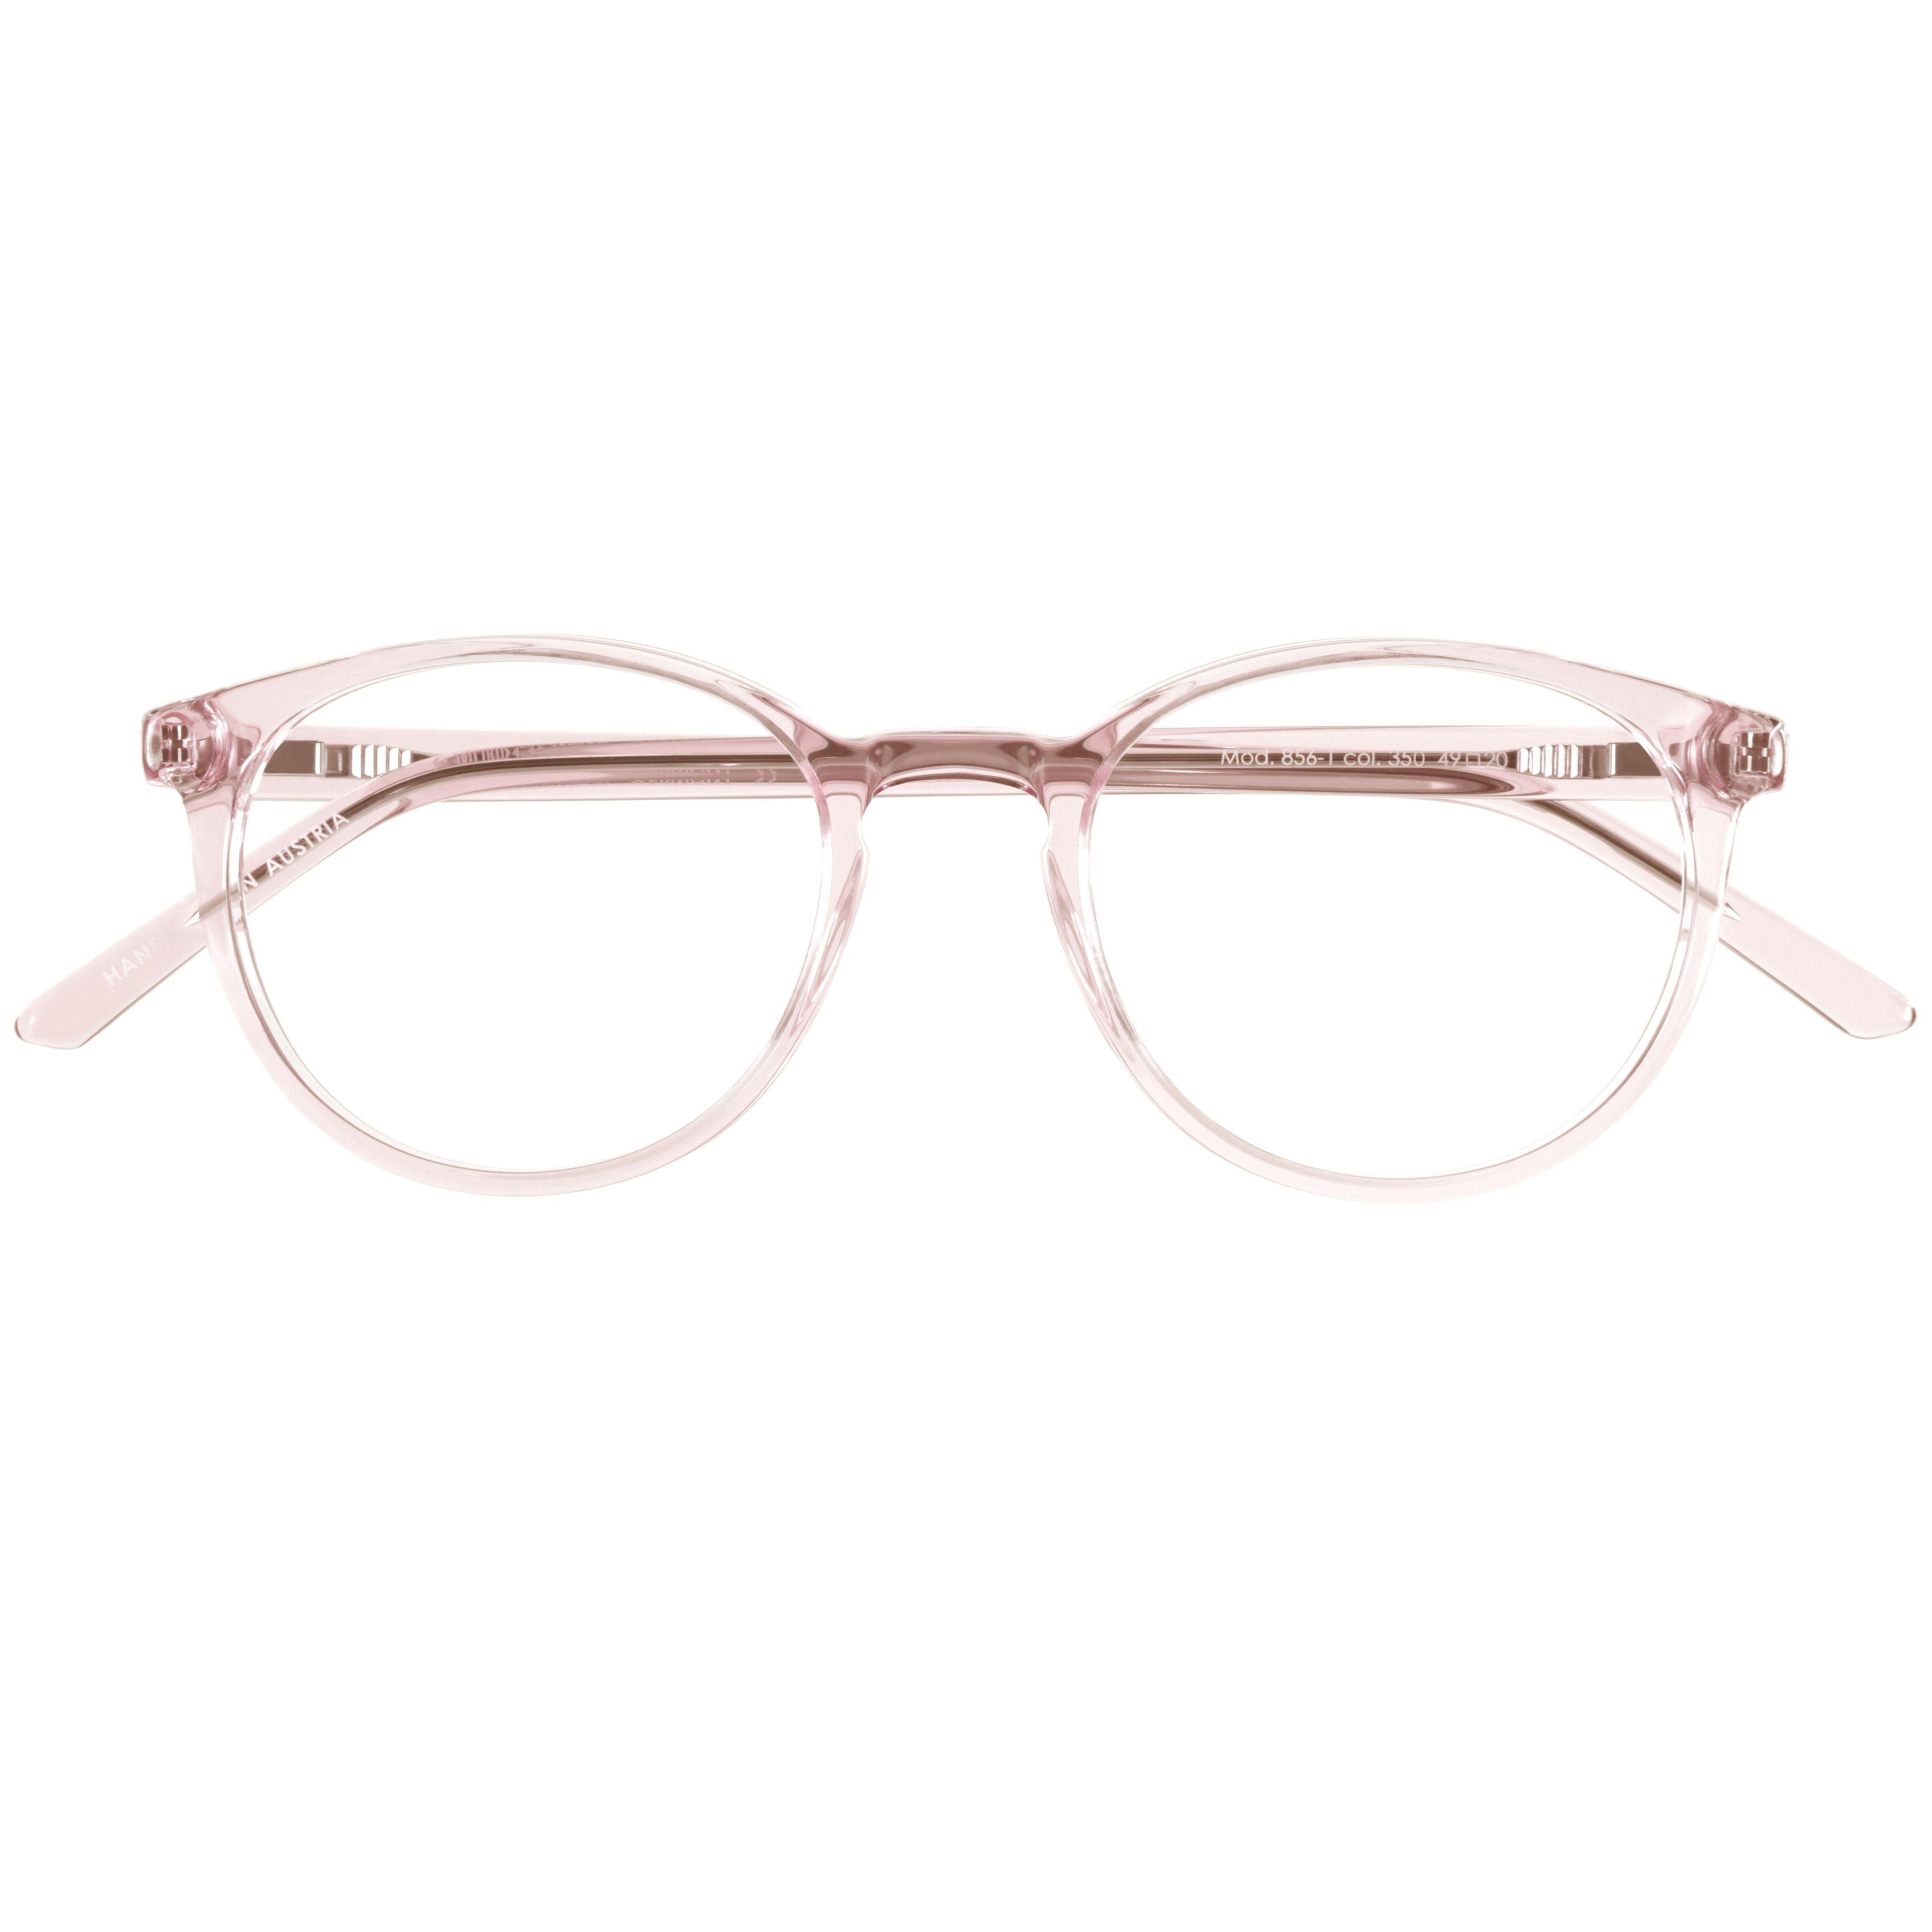 Photo of munic eyewear ∙ Startseite